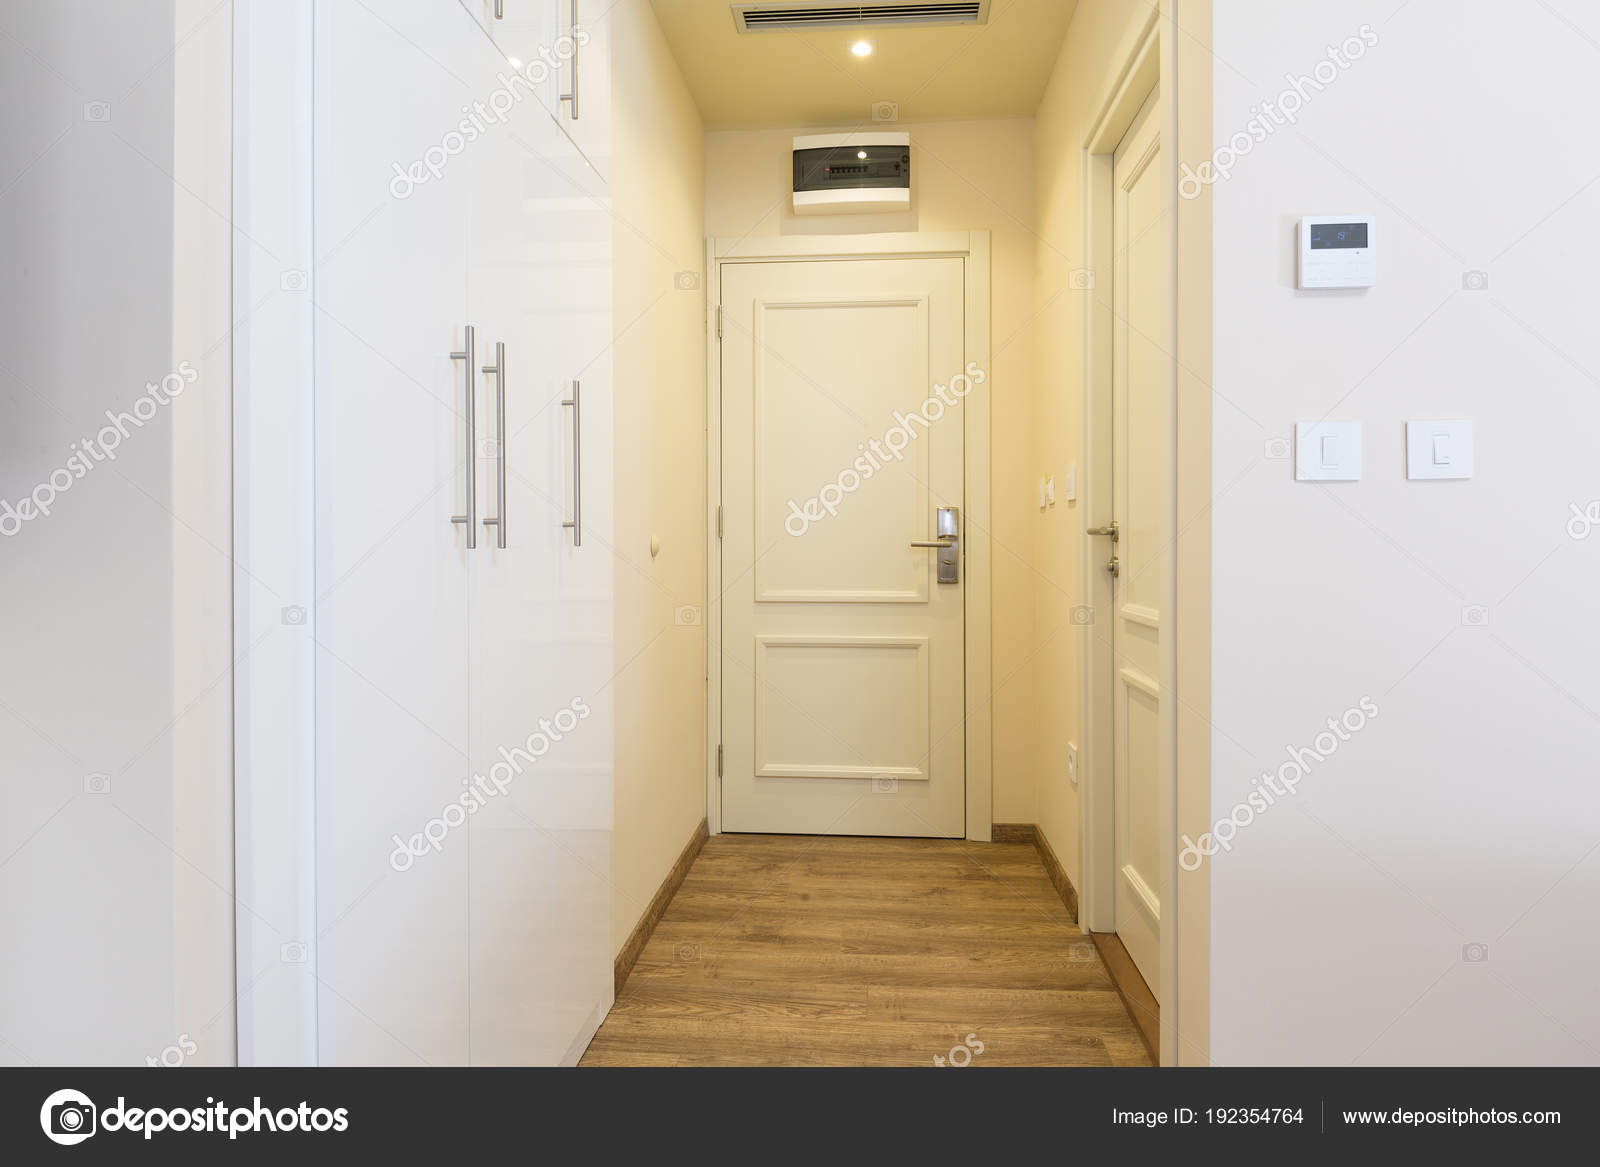 Ingang gang in hotel kamer interieur u2014 stockfoto © rilueda #192354764